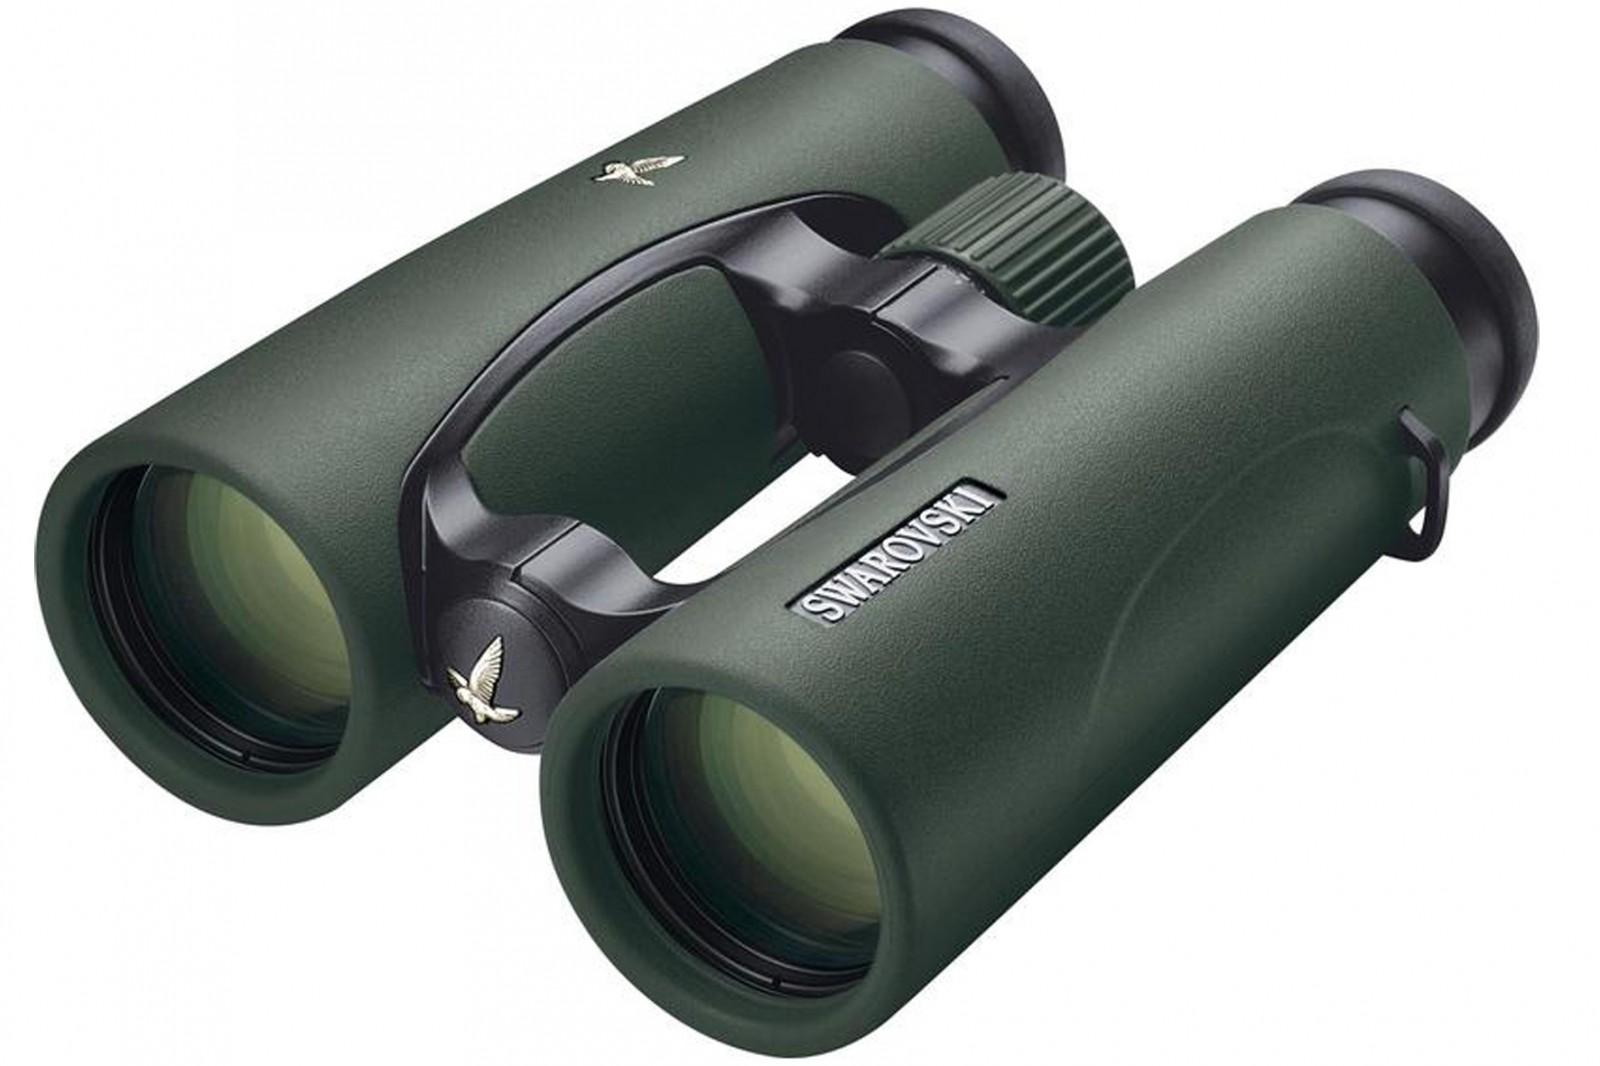 Nikon Entfernungsmesser Schweiz : Swarovski leica zeiss nikon canon sony pentax celestron vixen